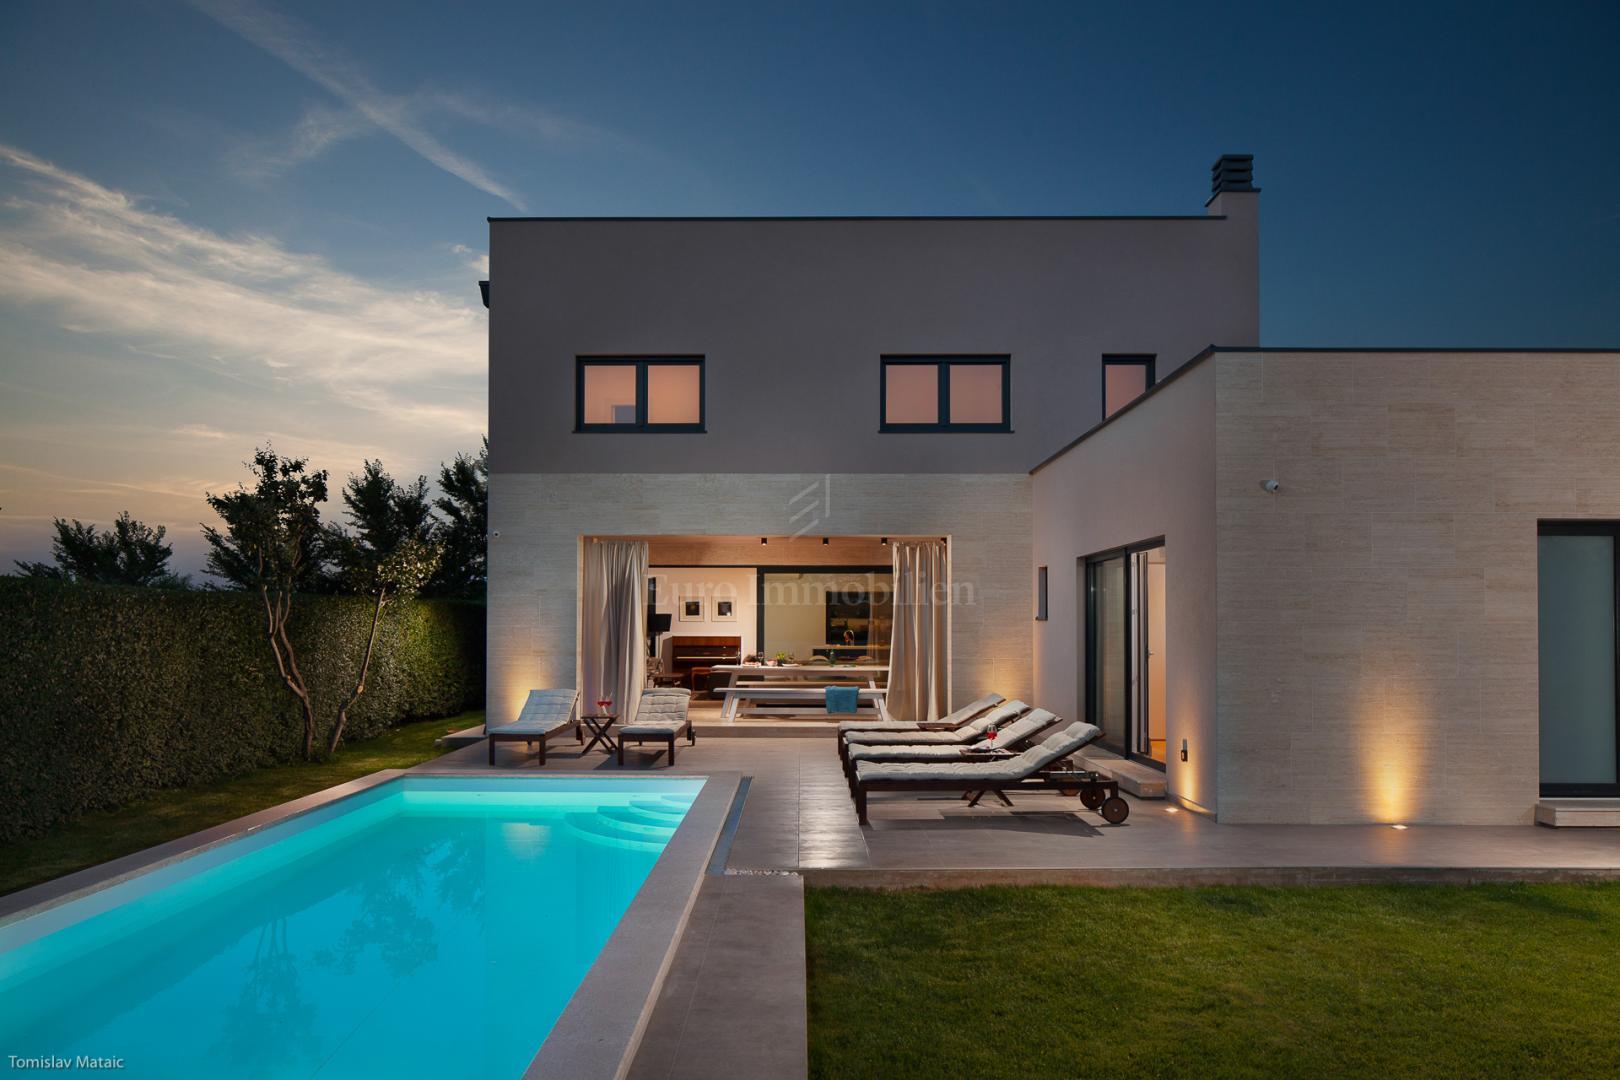 Prozračna villa s bazenom u mediteranskom okruženju!